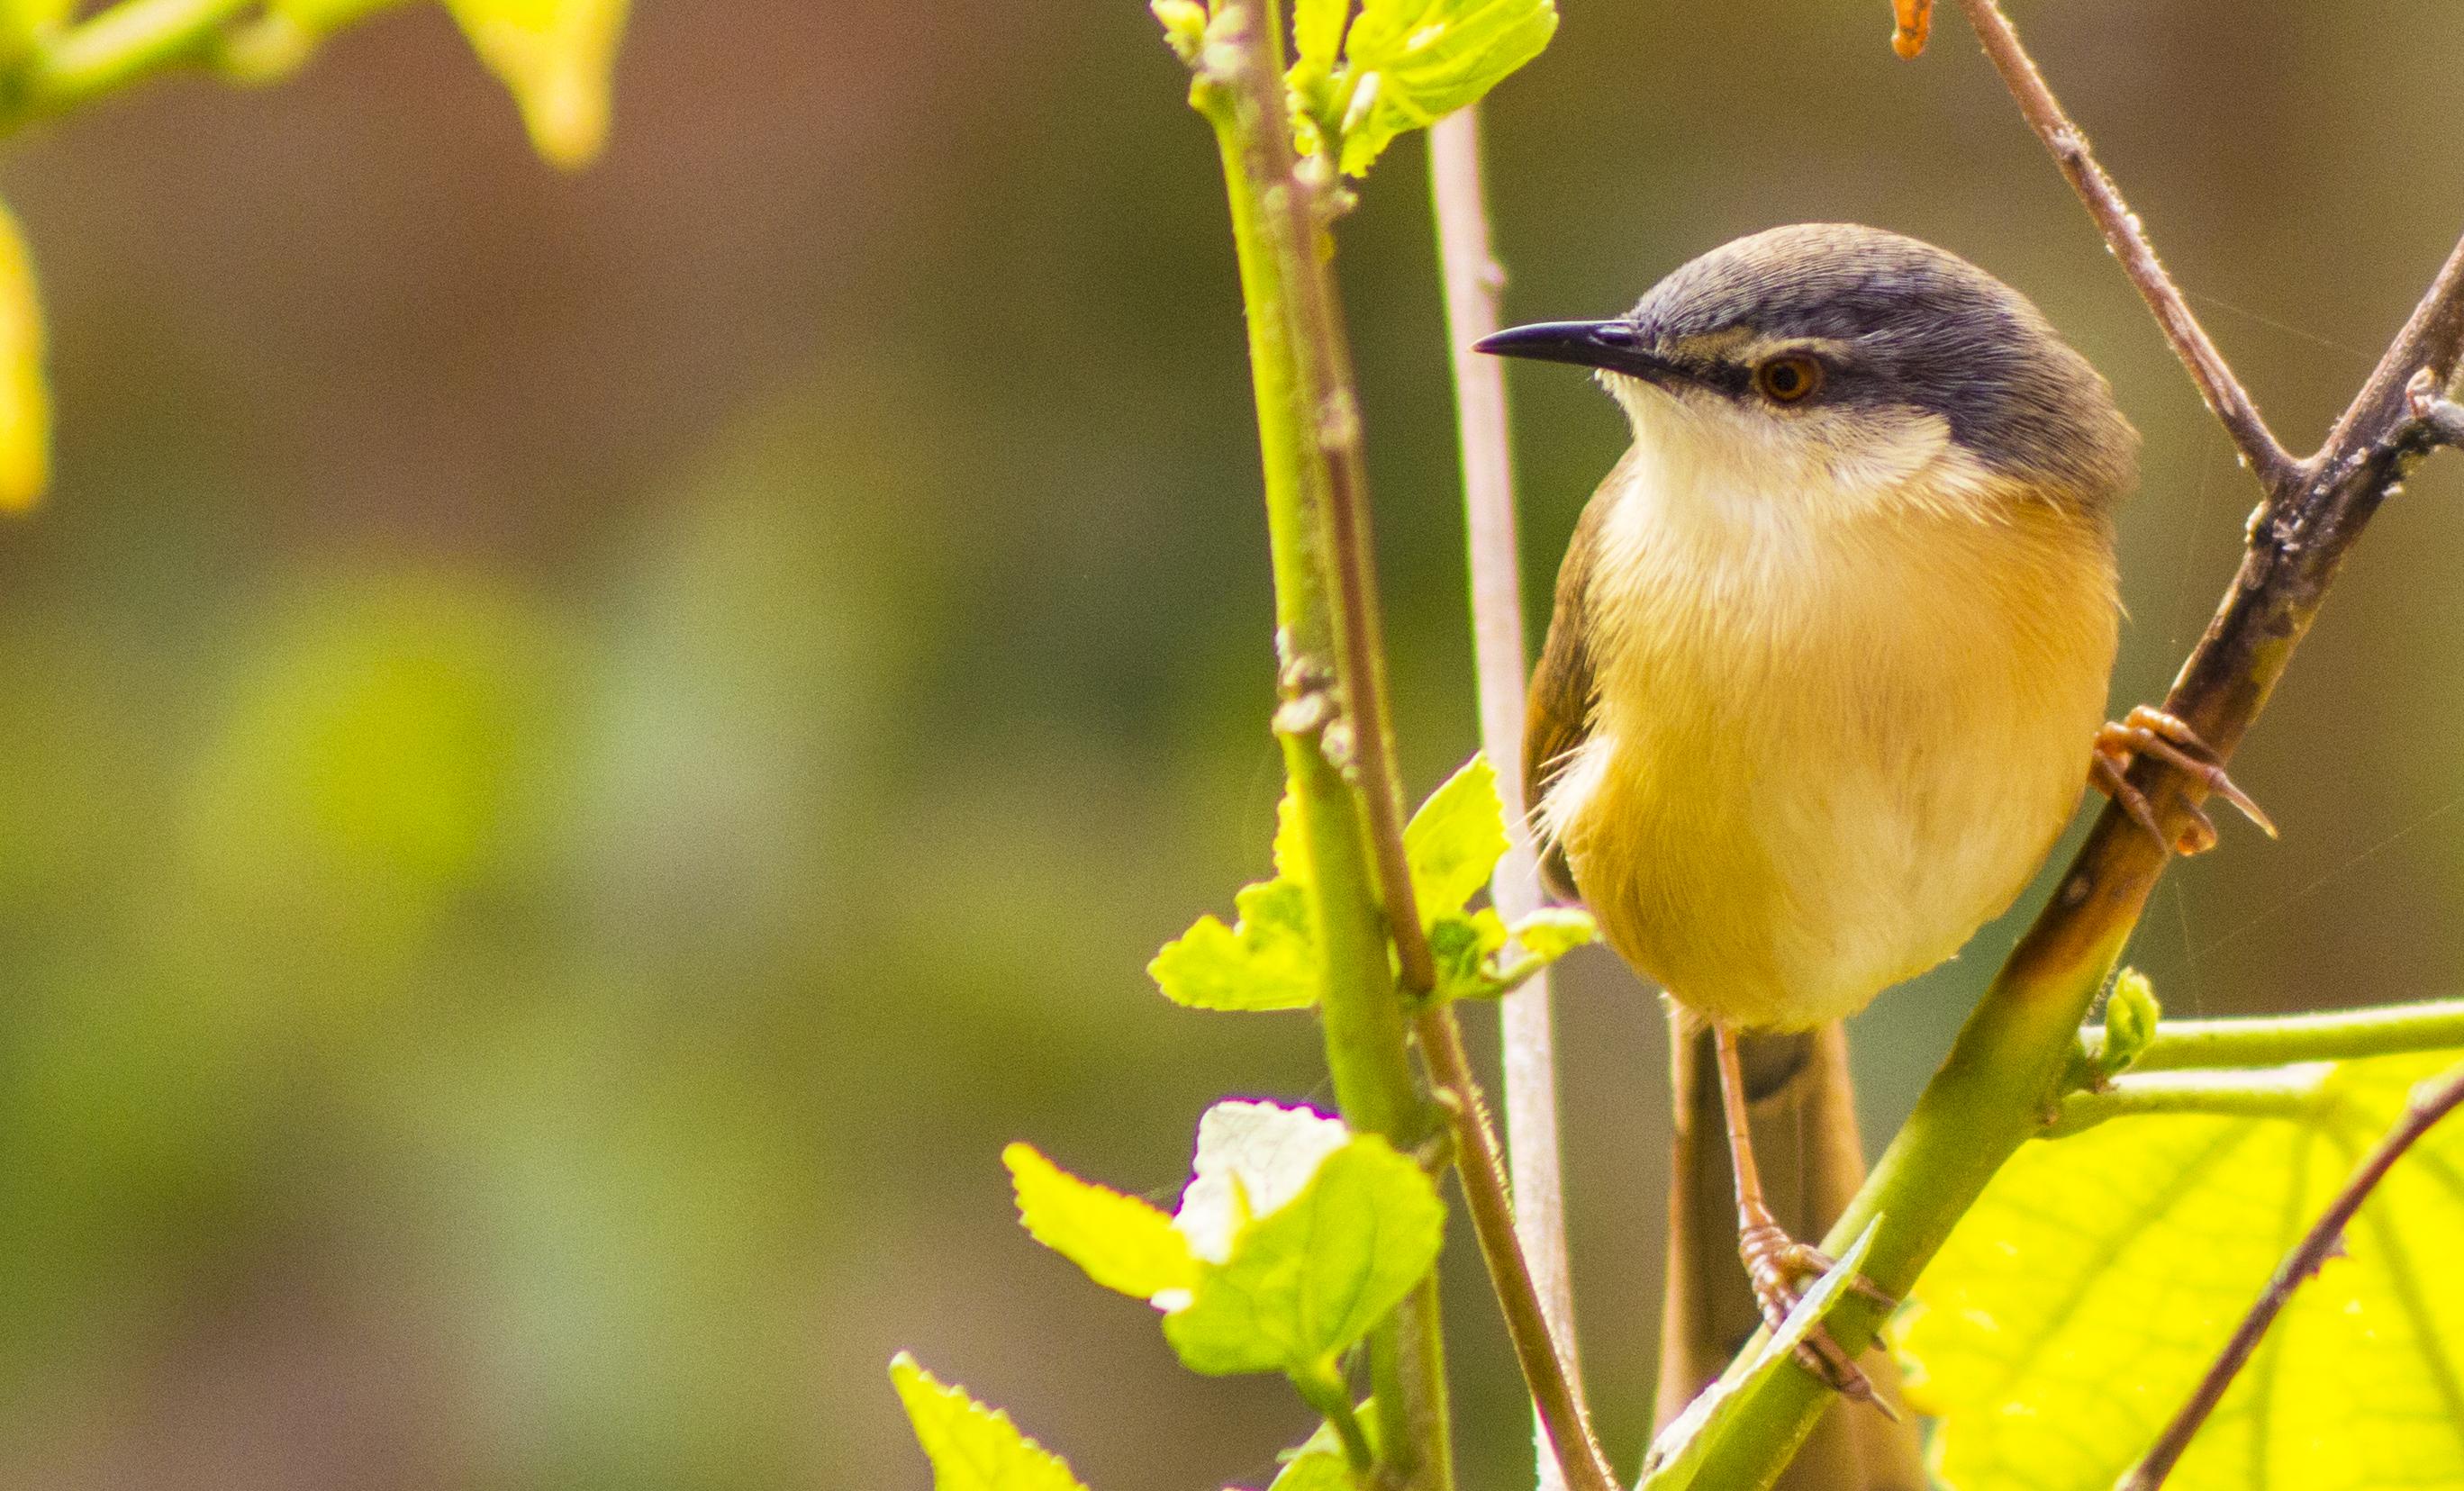 A bird in India